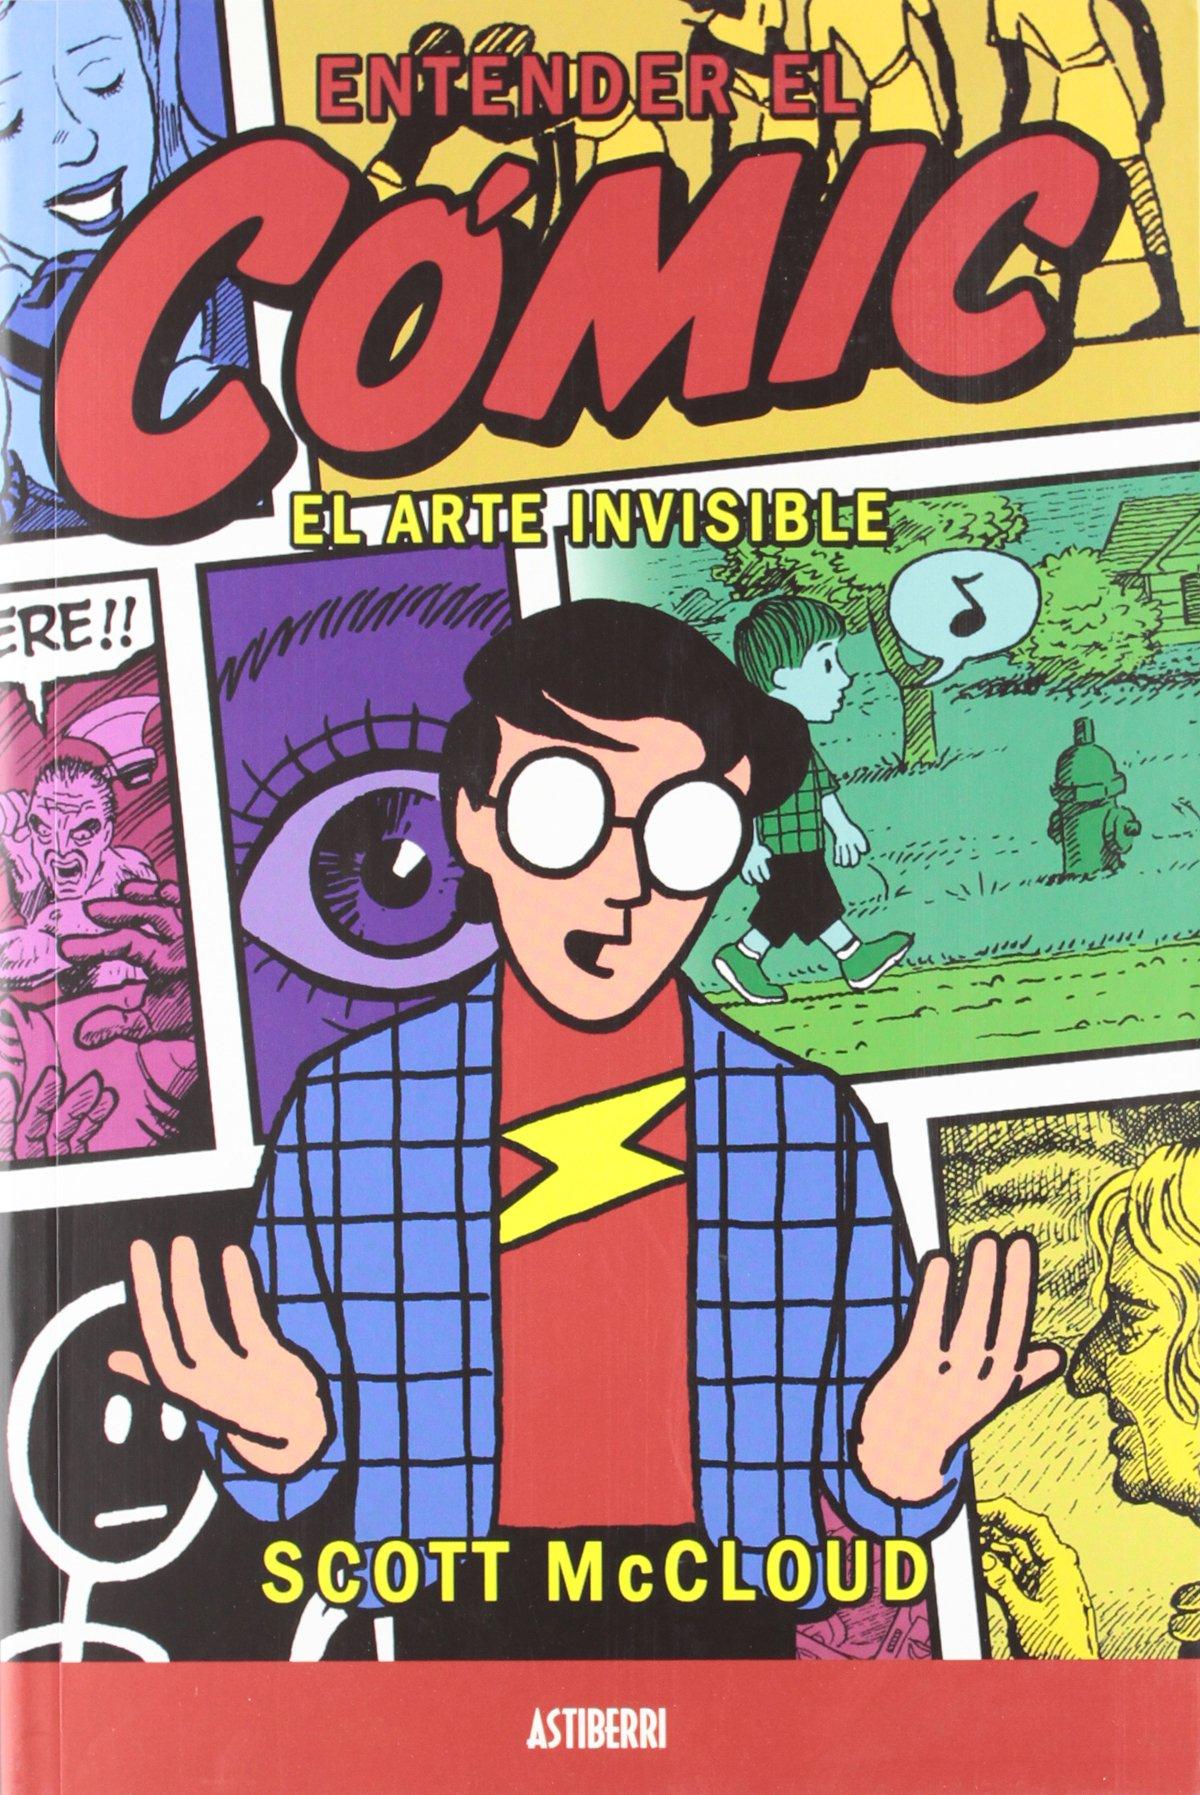 Entender El Comic Arte Invisible: El arte invisible Astiberri Ensayo: Amazon.es: McCloud, Scott: Libros